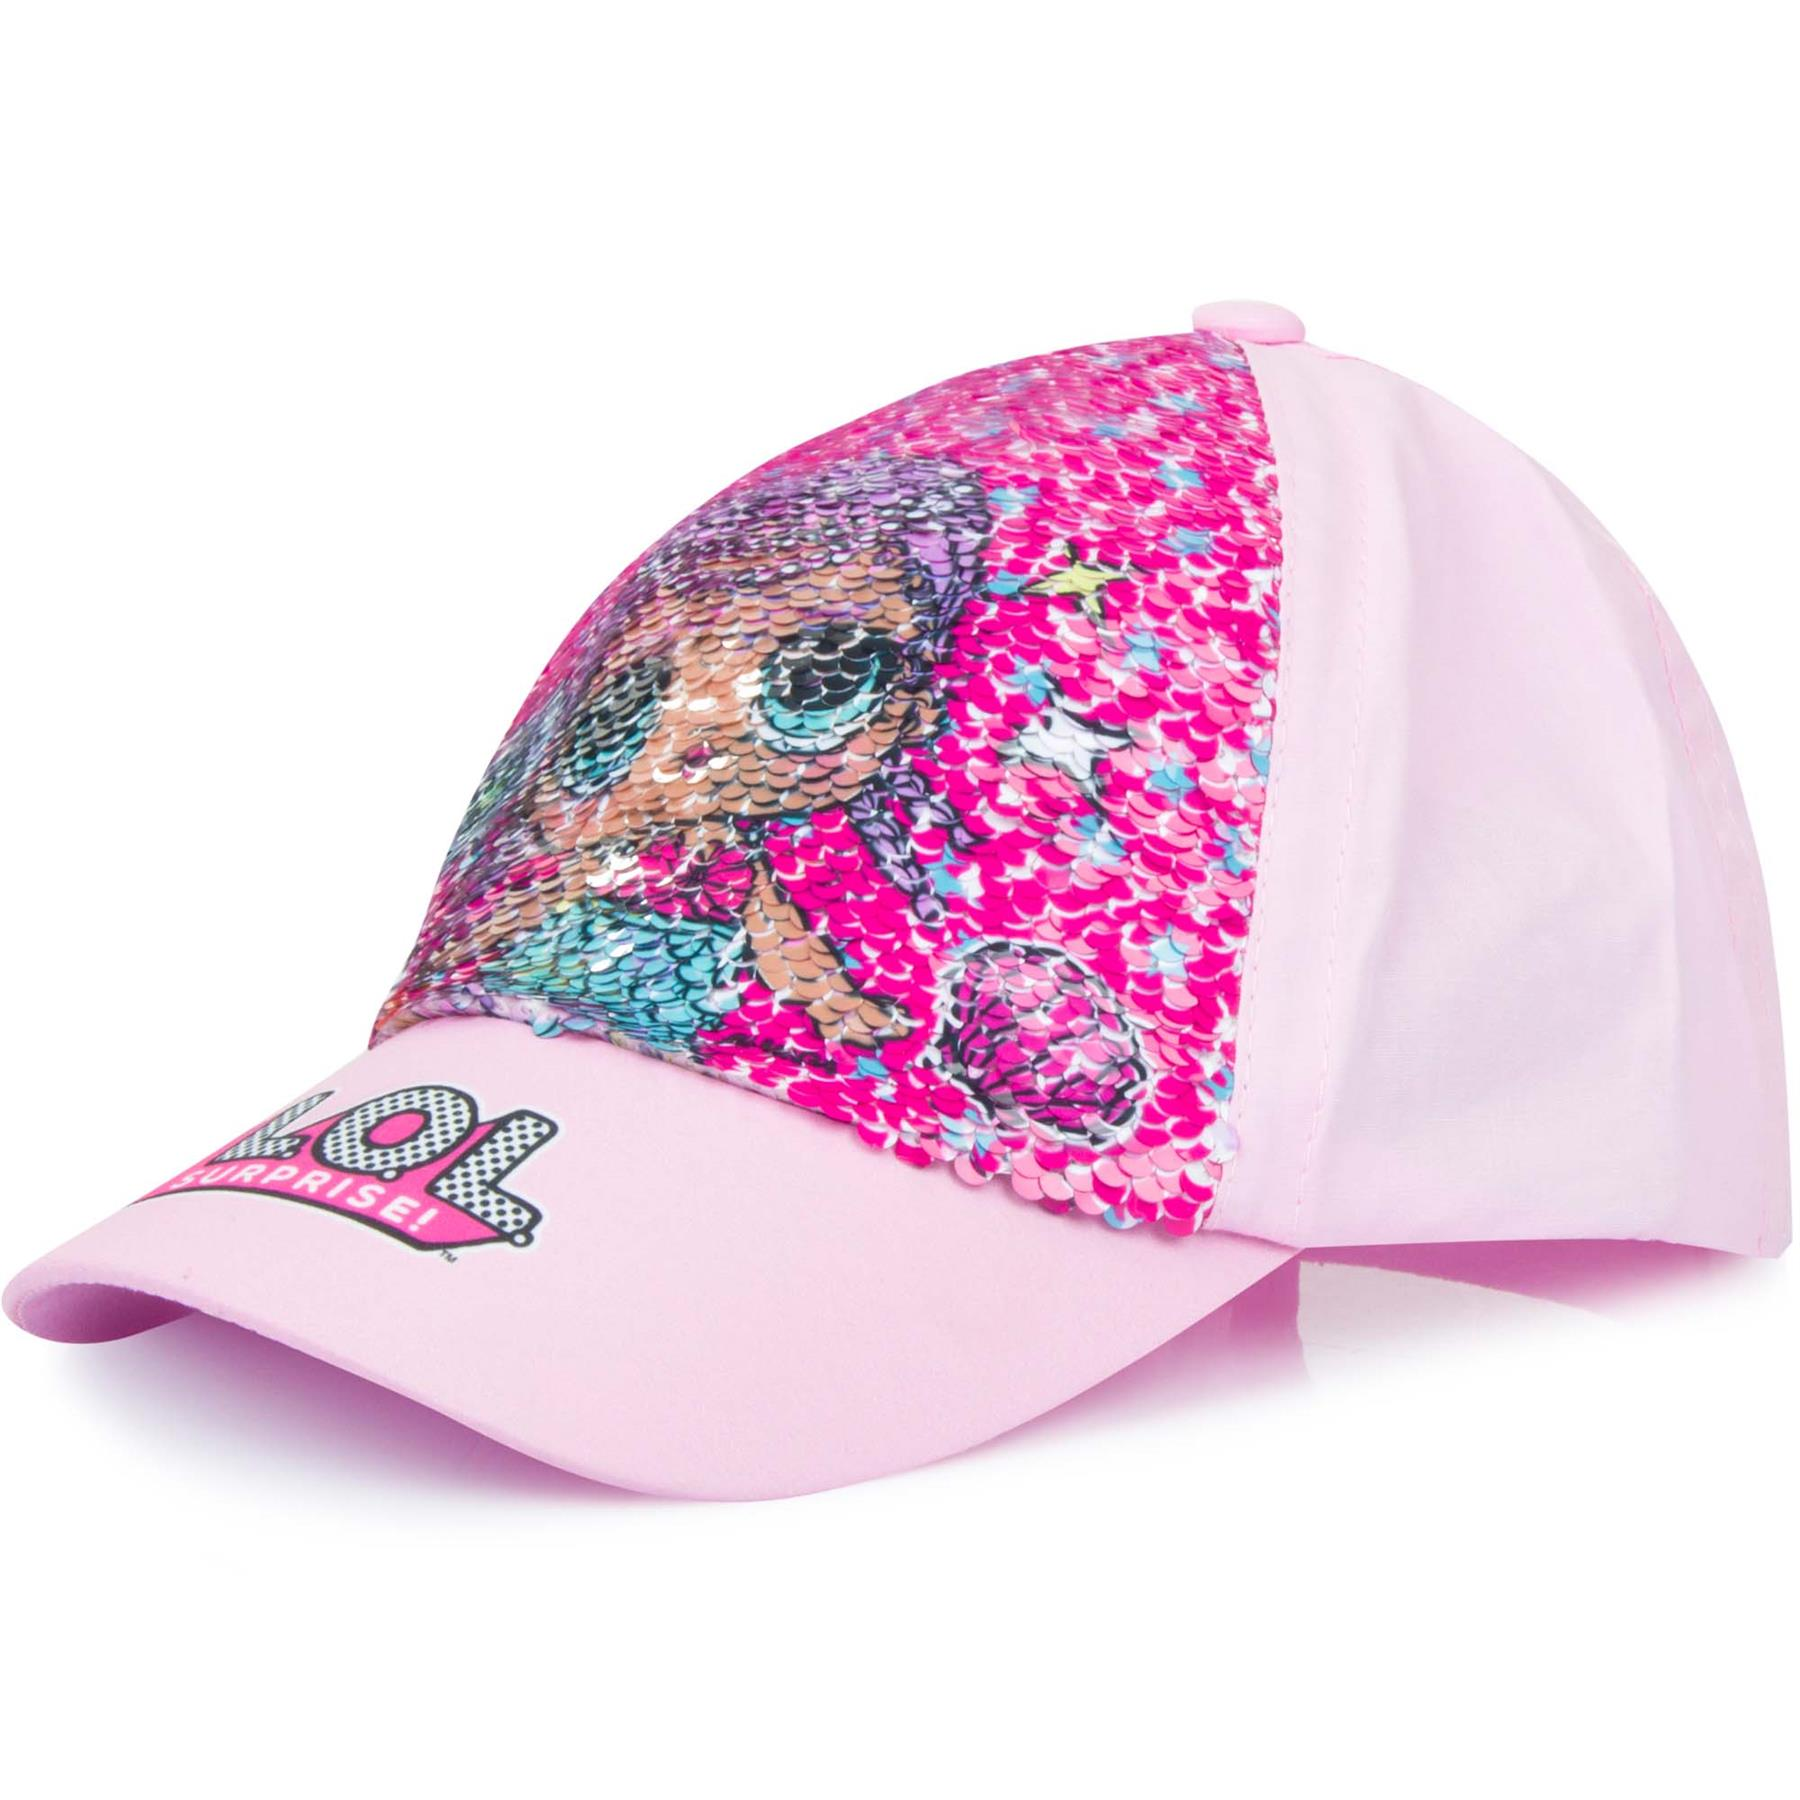 Girls-Cap-LOL-Surprise-Baseball-Reversible-Pink-Sequin-Hat-Sun-Summer thumbnail 4